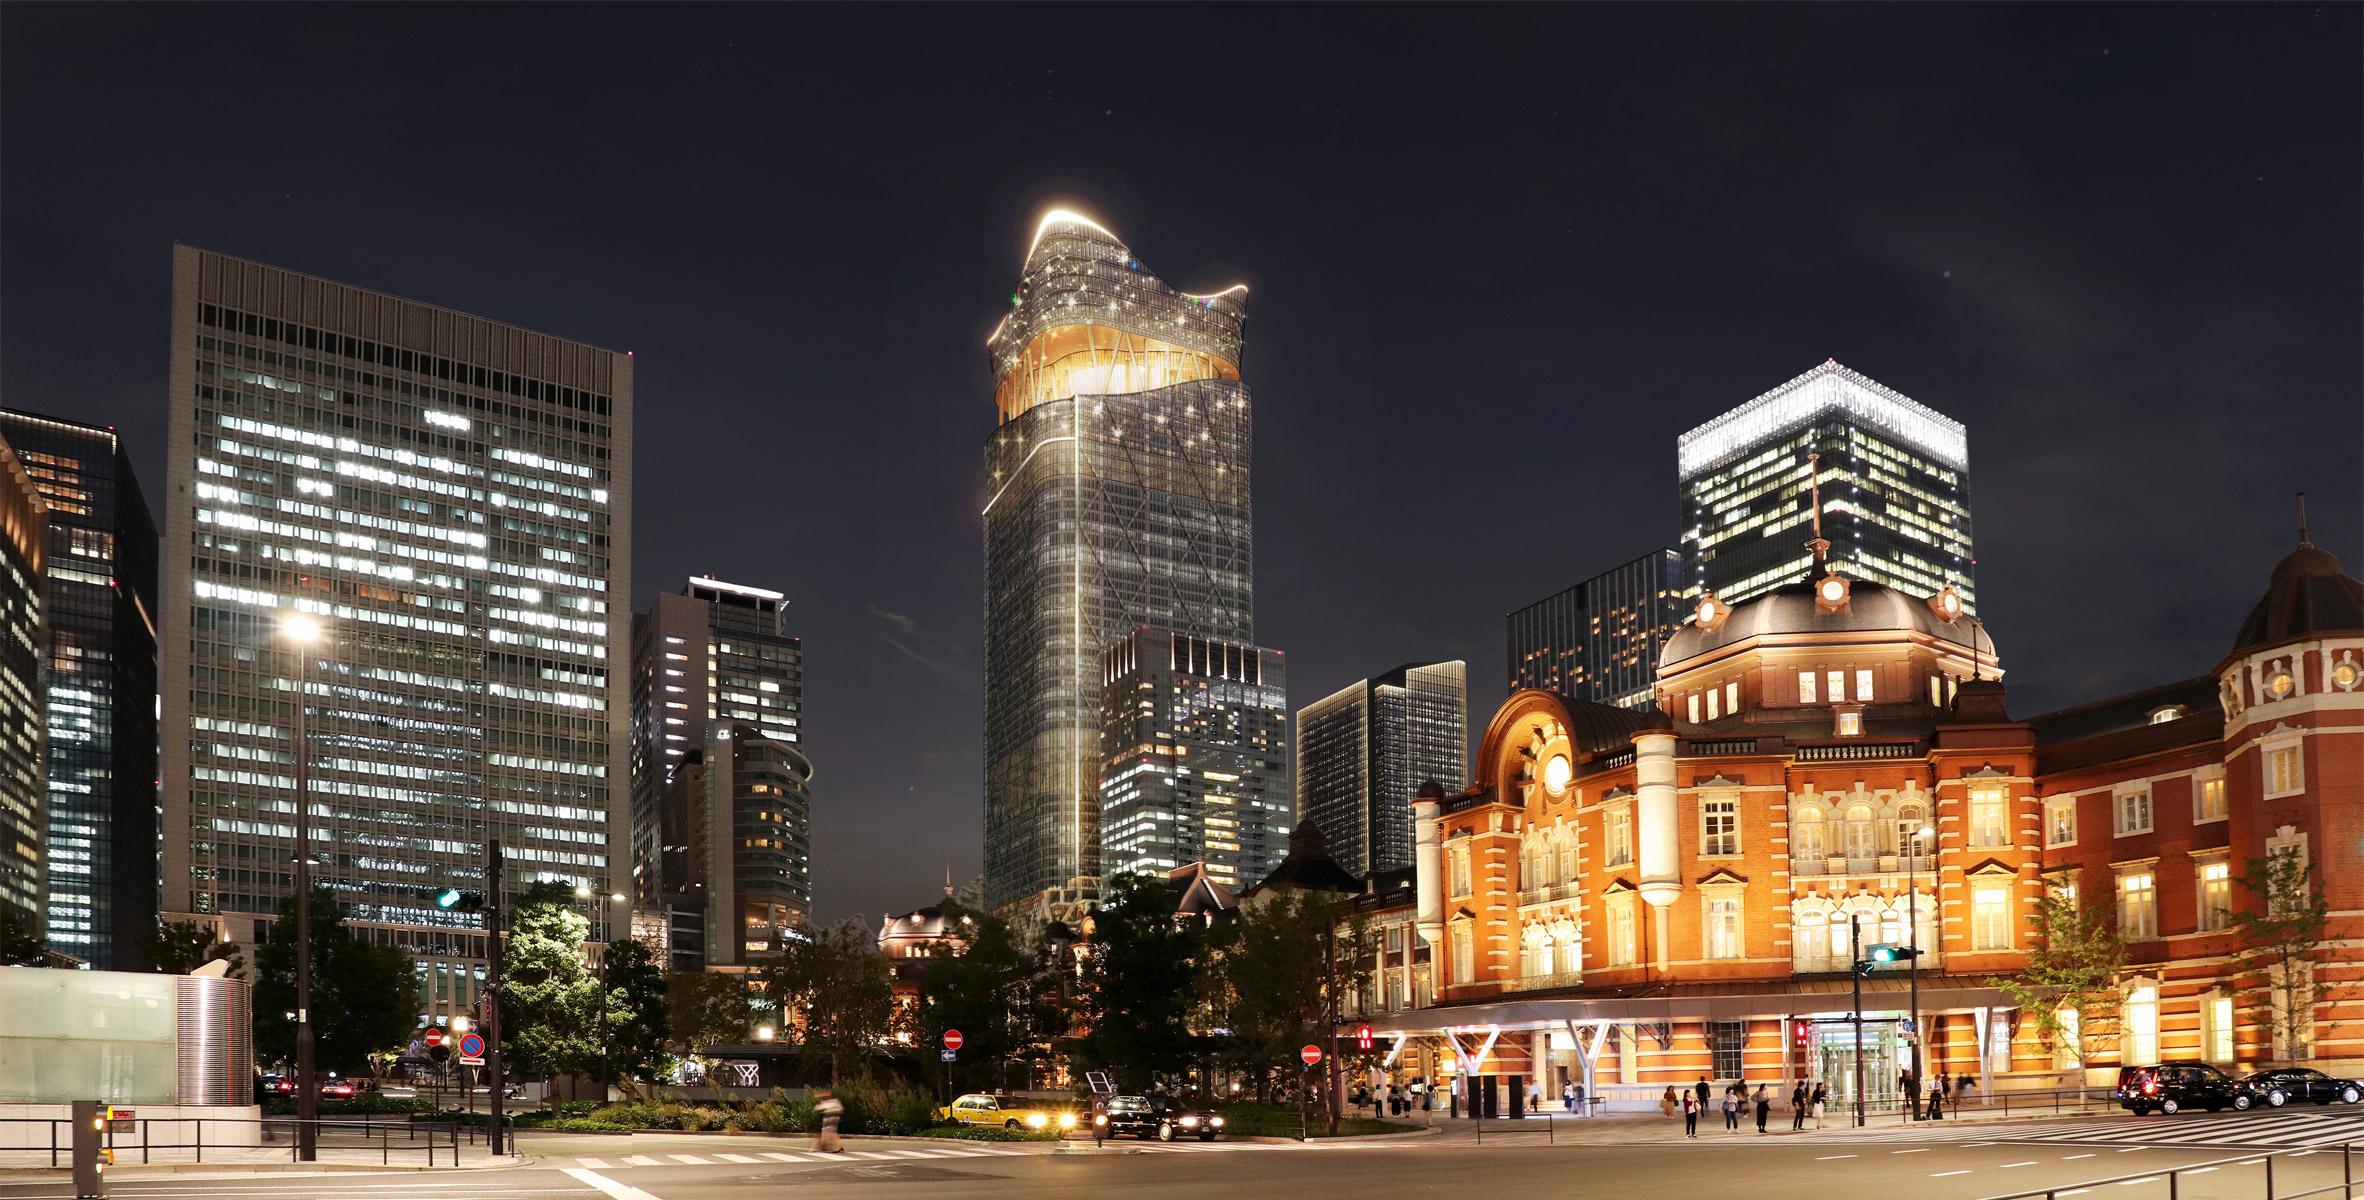 A visual of a supertall skyscraper in Tokyo, Japan